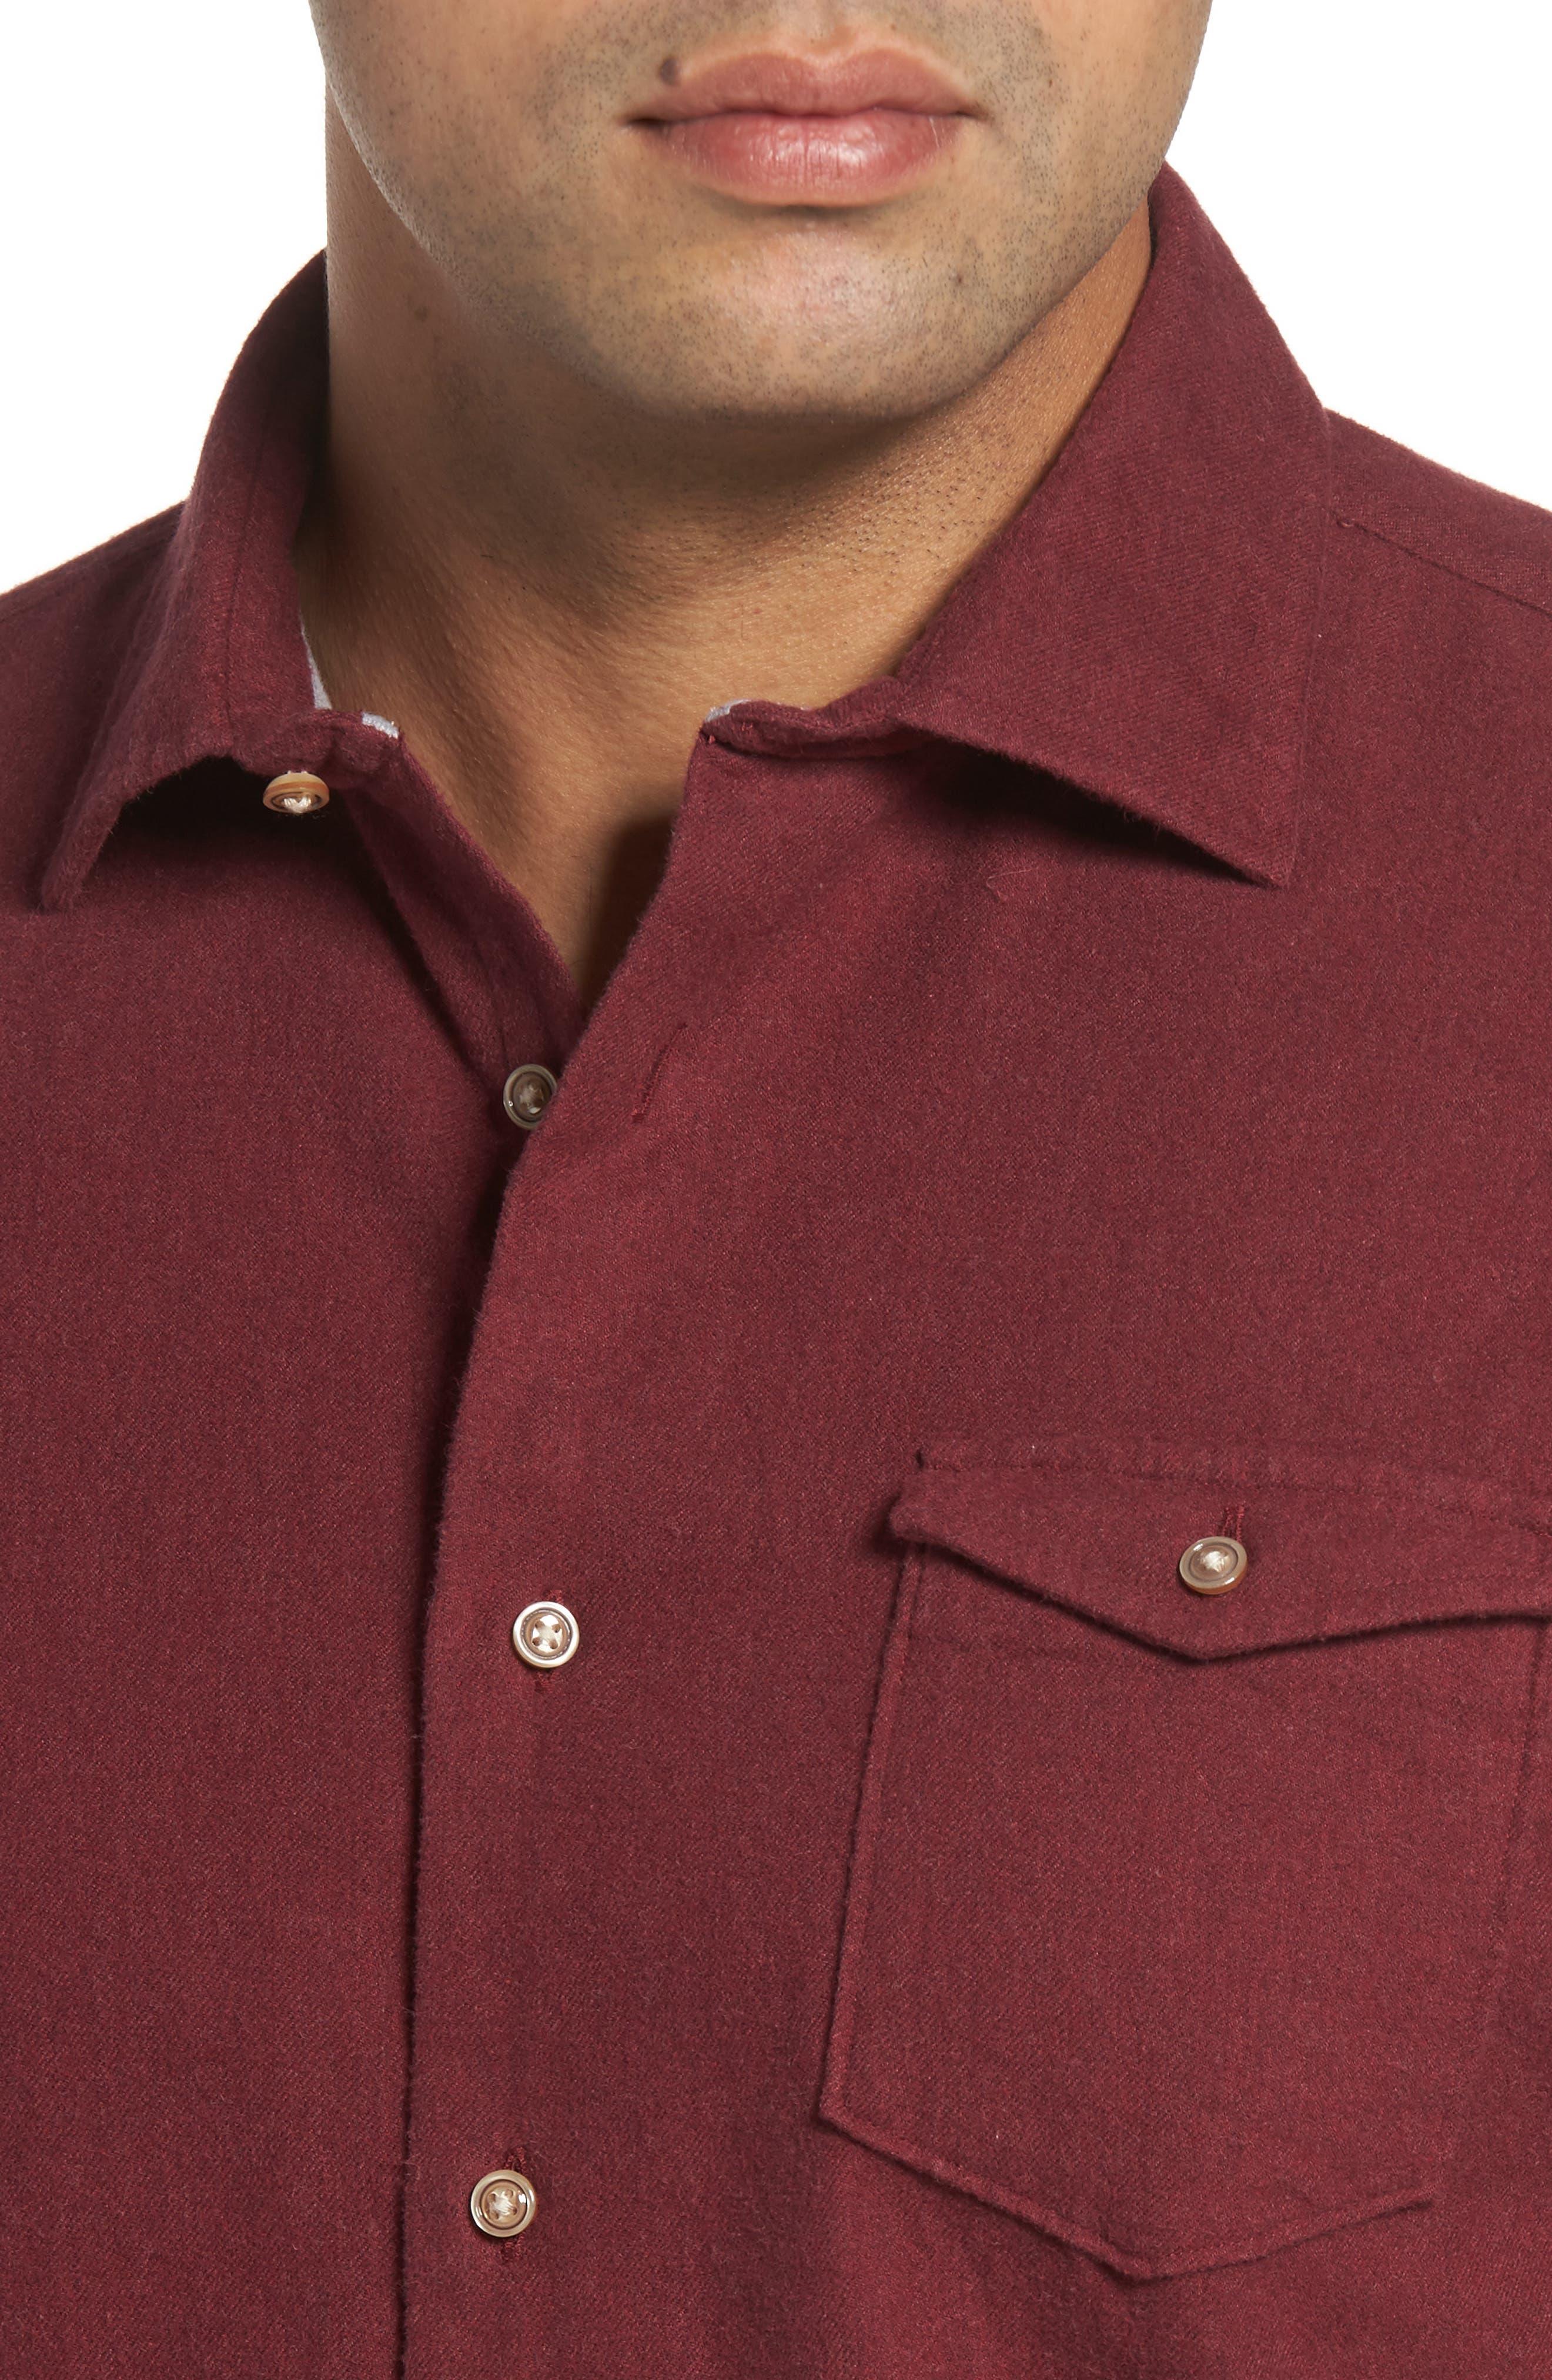 Patch Classic Fit Sport Shirt,                             Alternate thumbnail 4, color,                             934